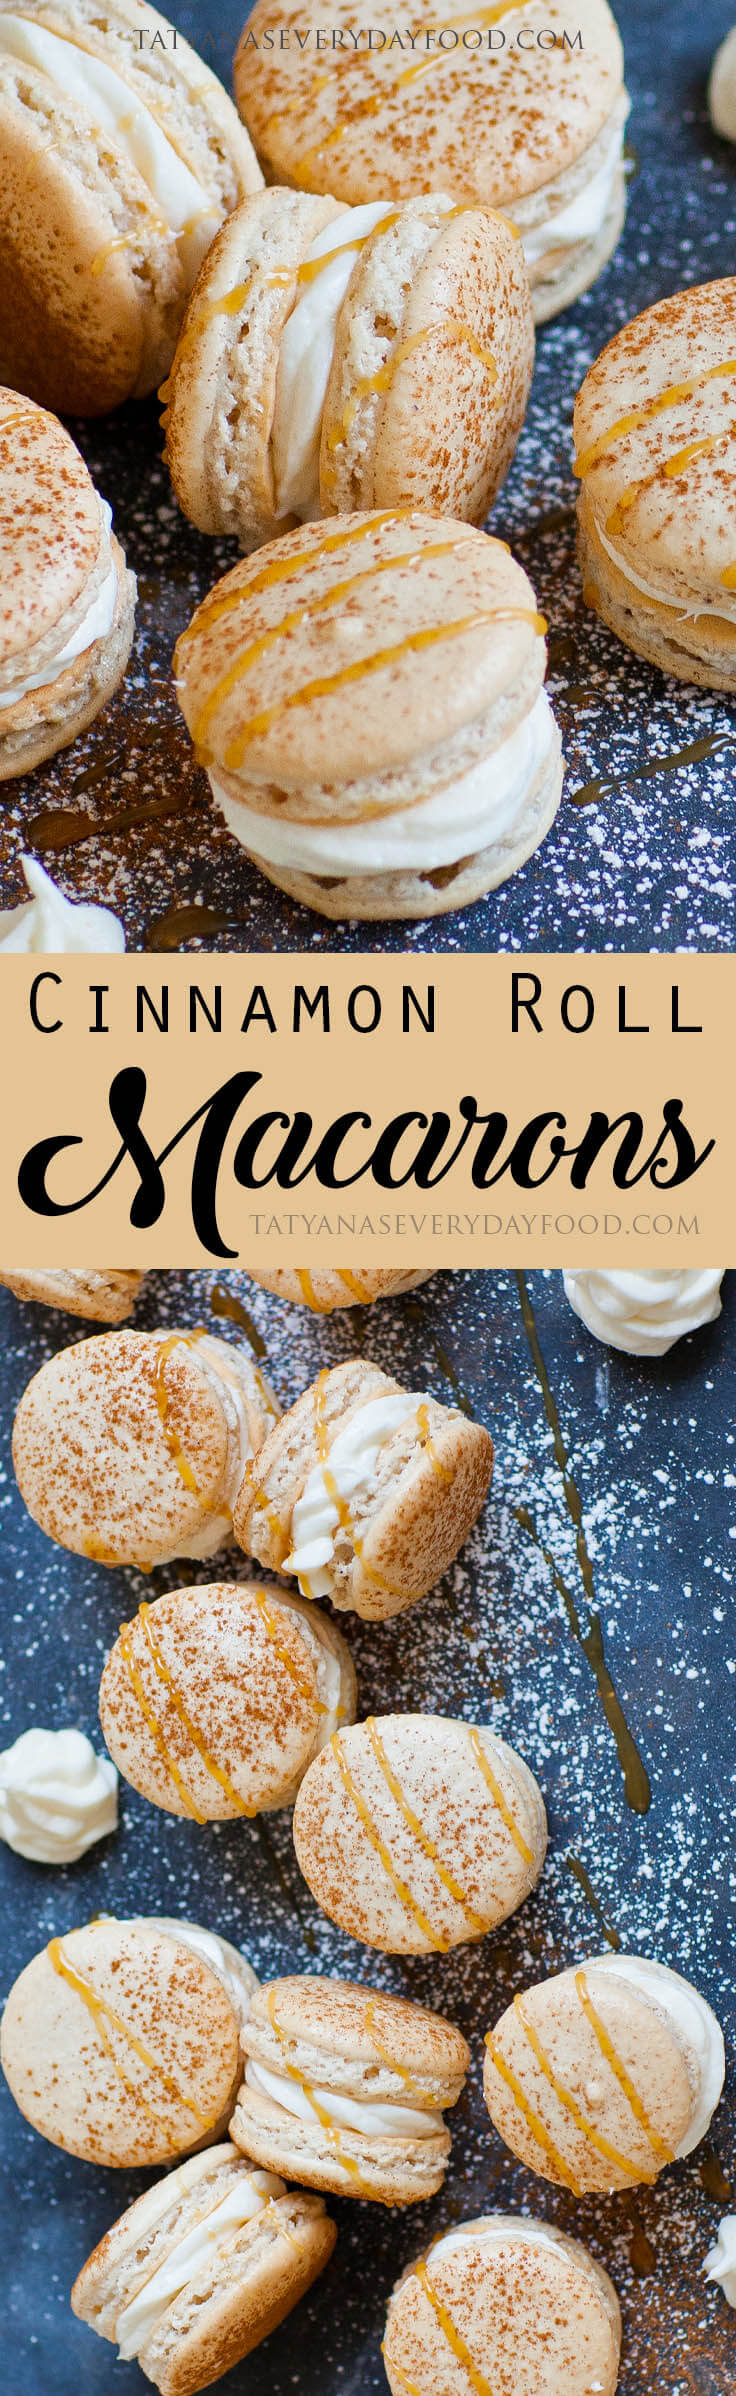 Cinnamon Roll Macarons with caramel